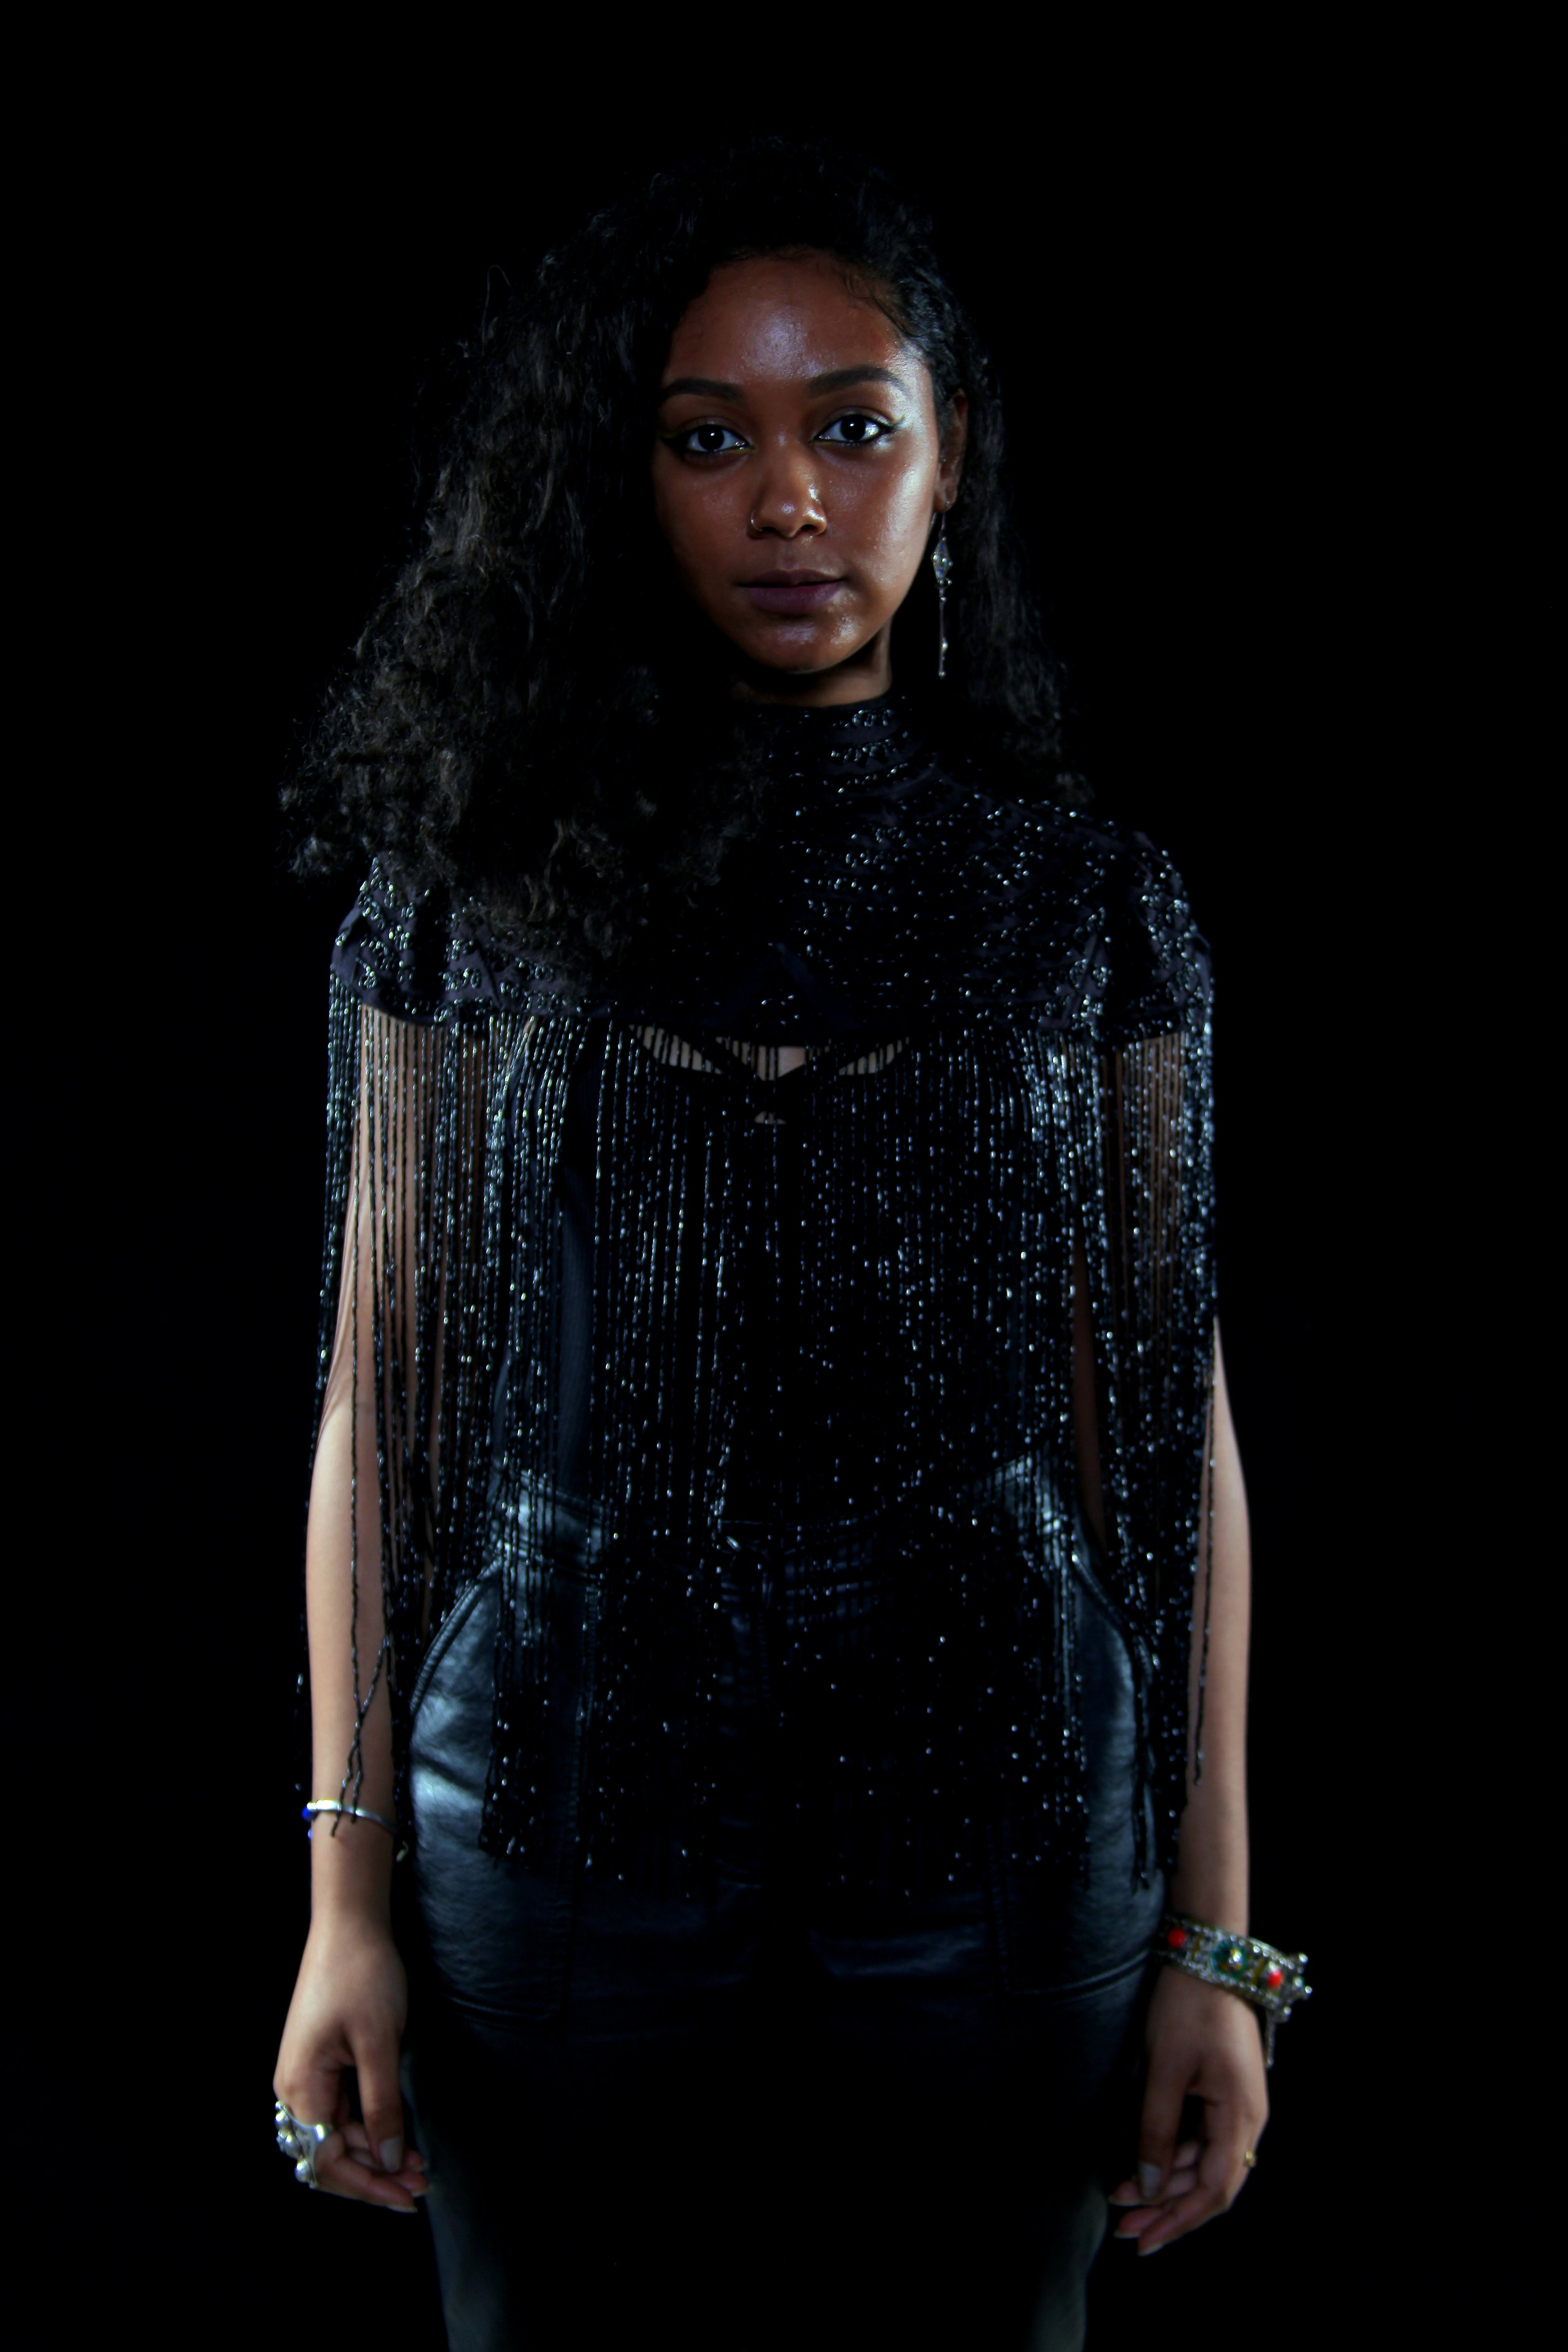 Photo of Safia Elhillo by  Dexter R. Jones